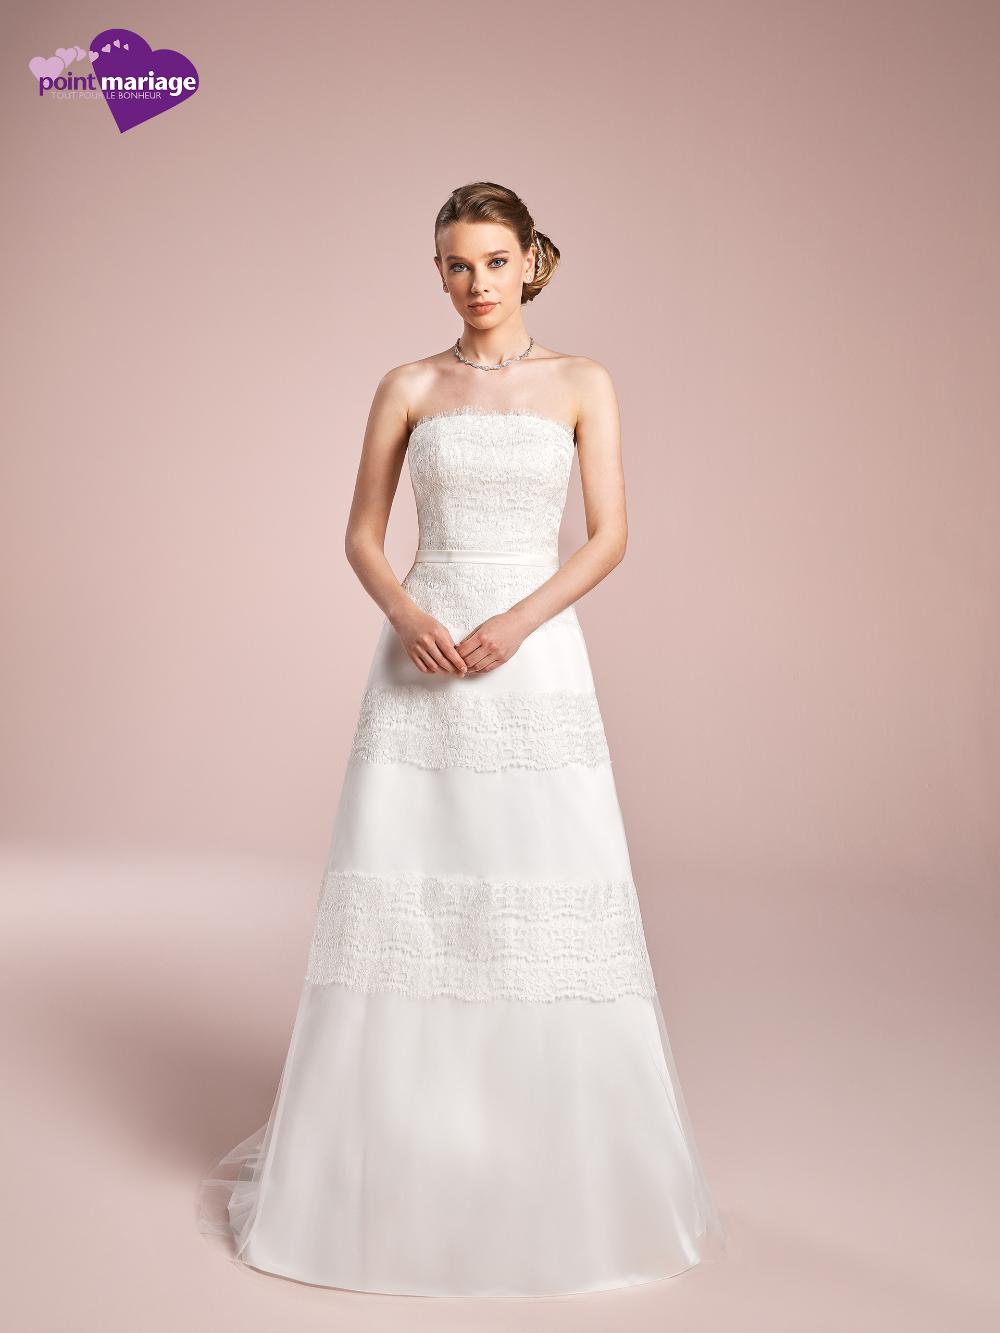 Robe de mariée Valence | Point Mariage |